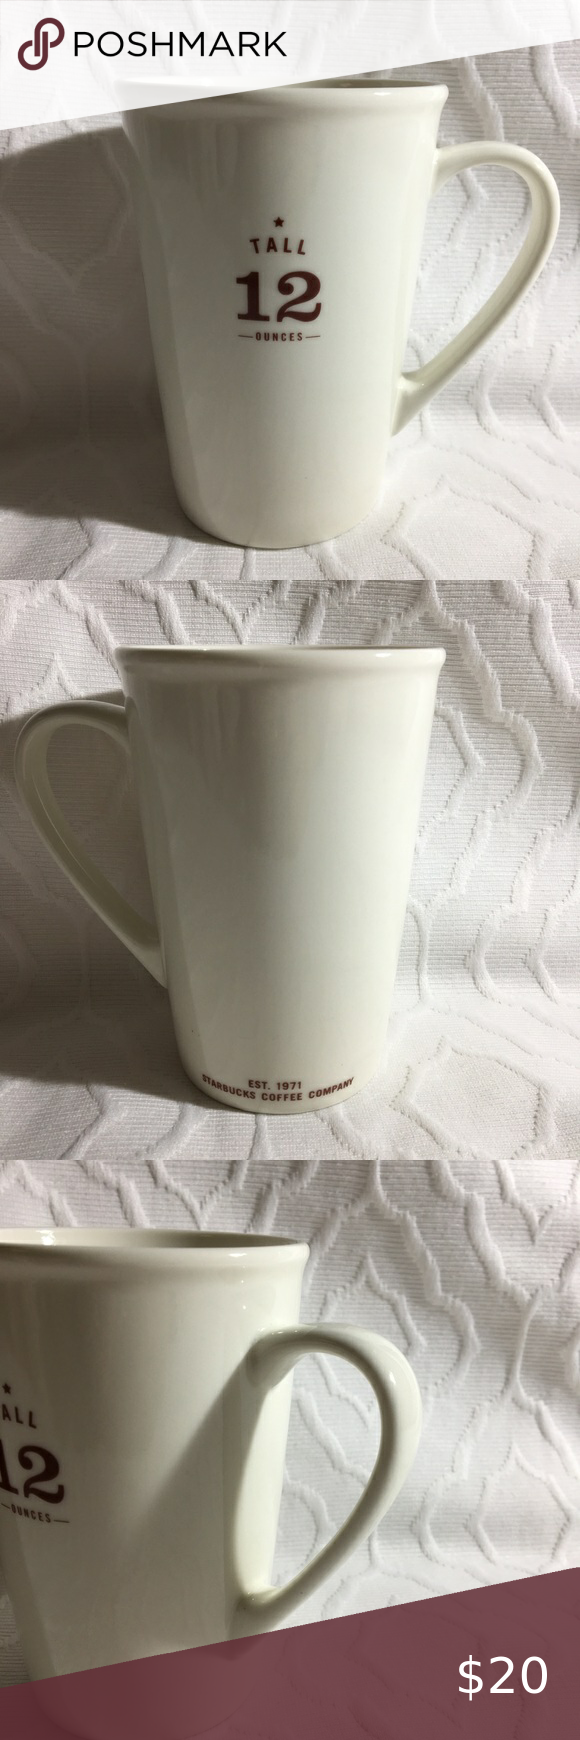 STARBUCKS Coffee Cups 2010 TALL 12 Ounces Mug in 2020